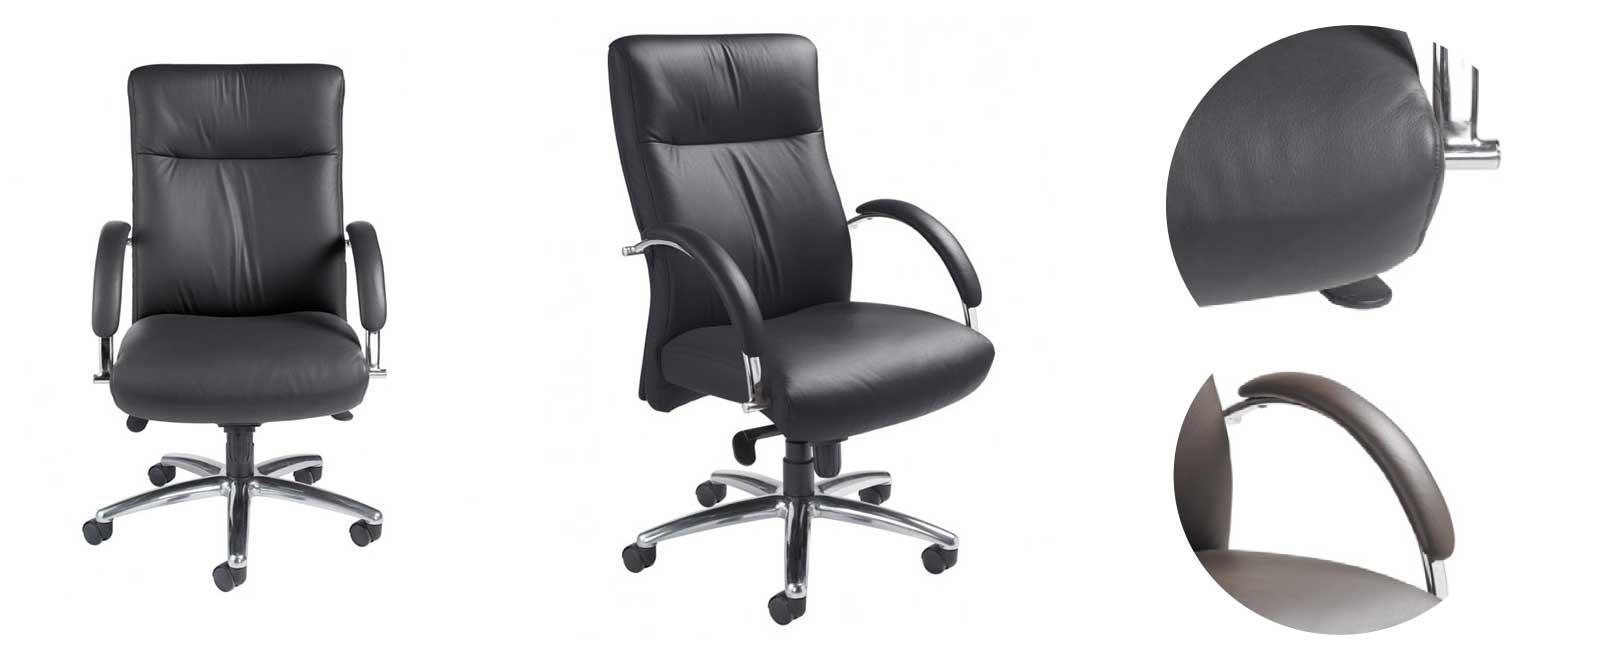 Khroma Chair with black onyx vinyl